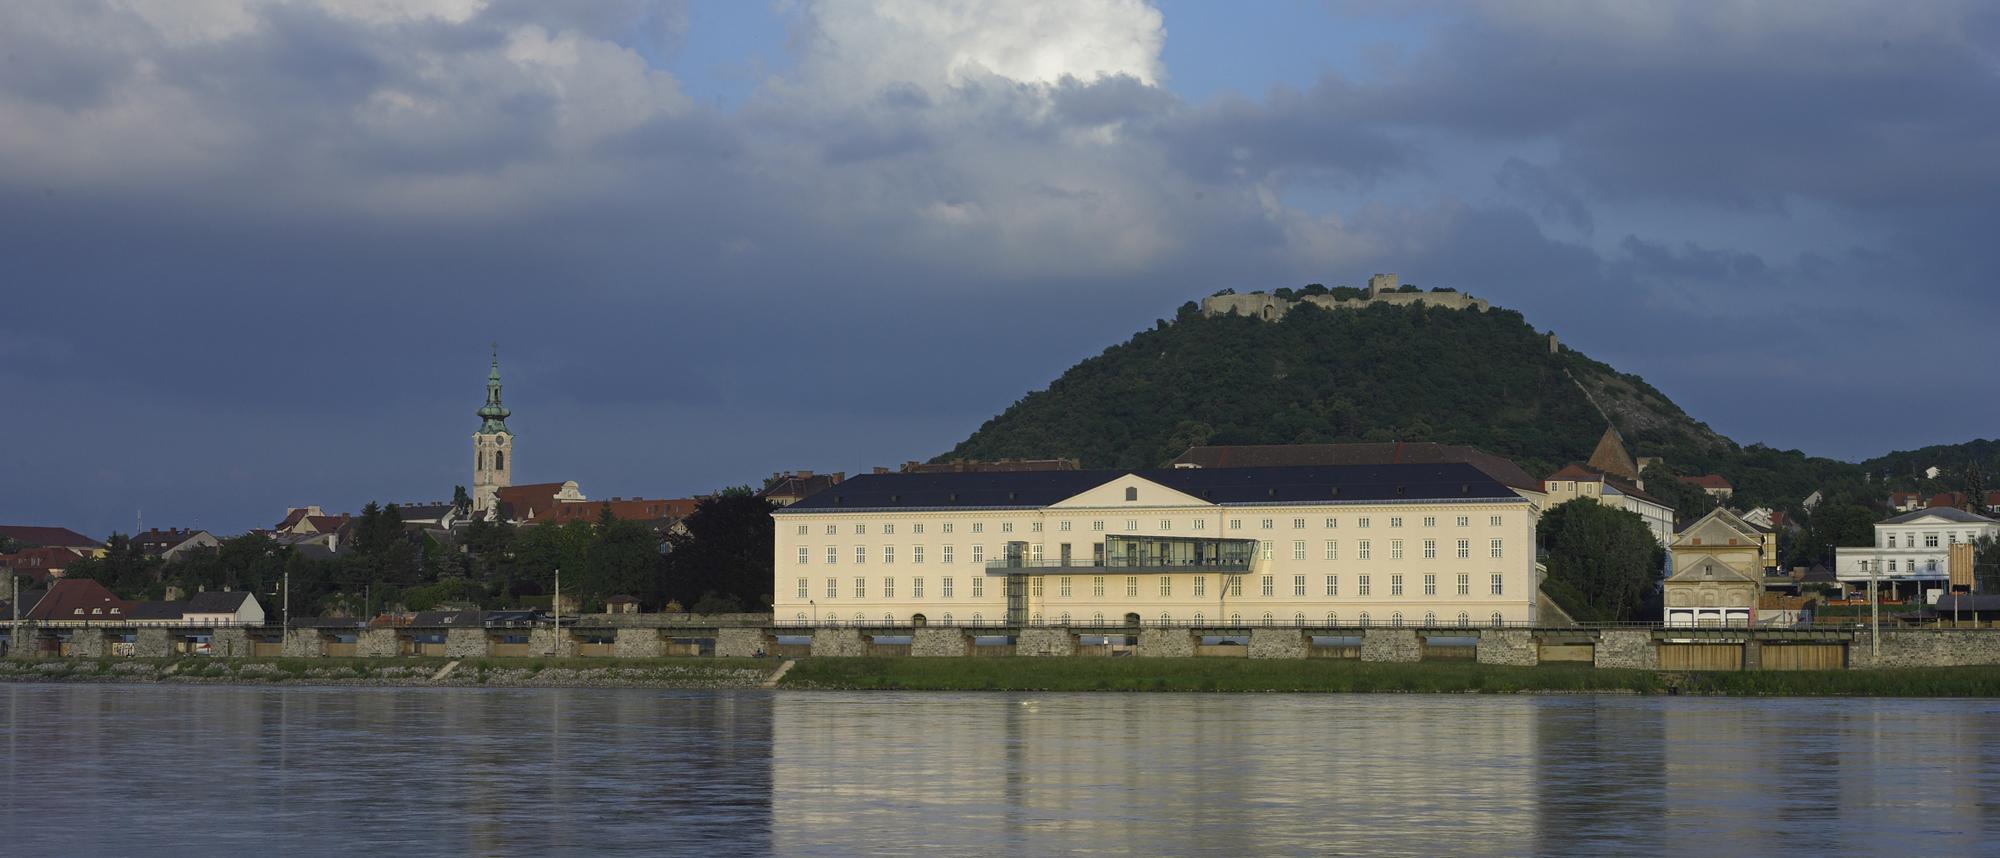 Ausstellungsstandort Kulturfabrik Hainburg bei Tag © Stefan Baumann